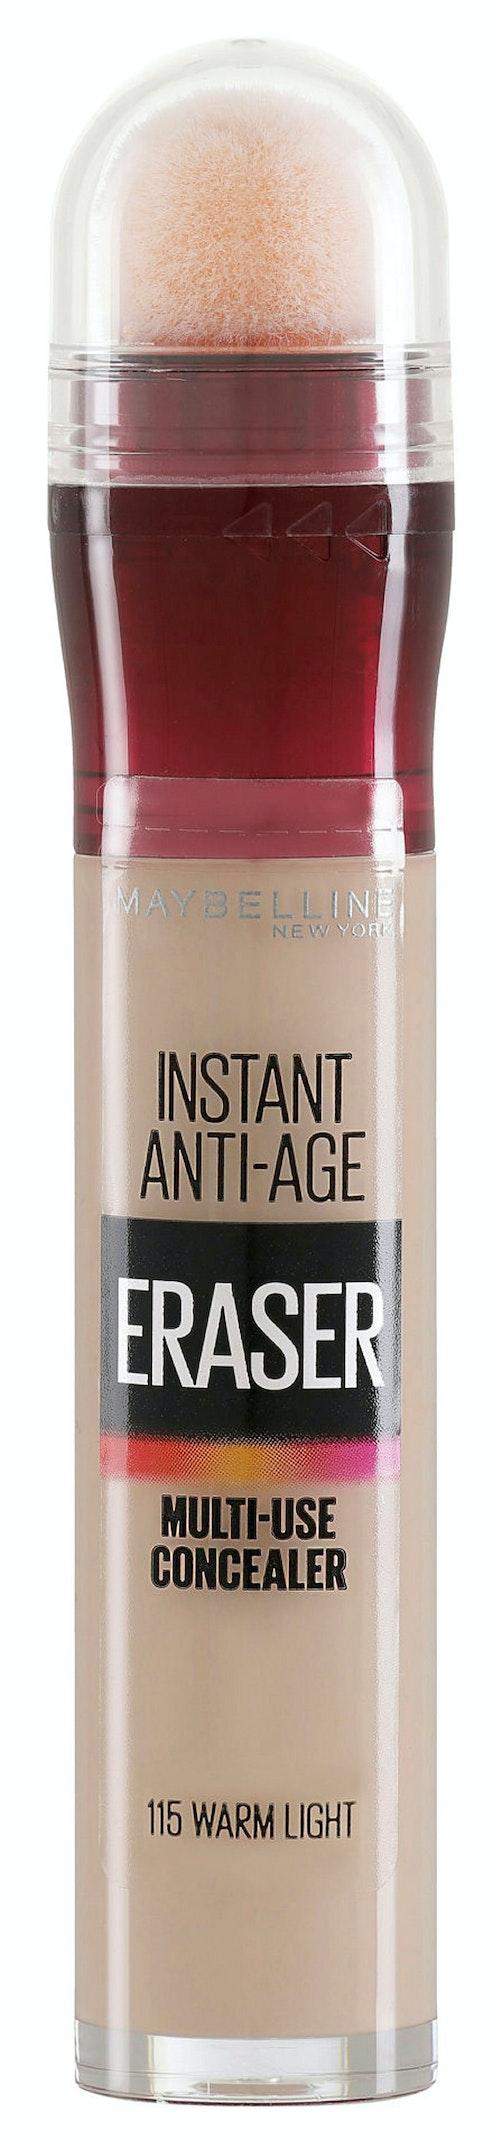 Maybelline Instant Anti Age Eraser Warm light 1 stk